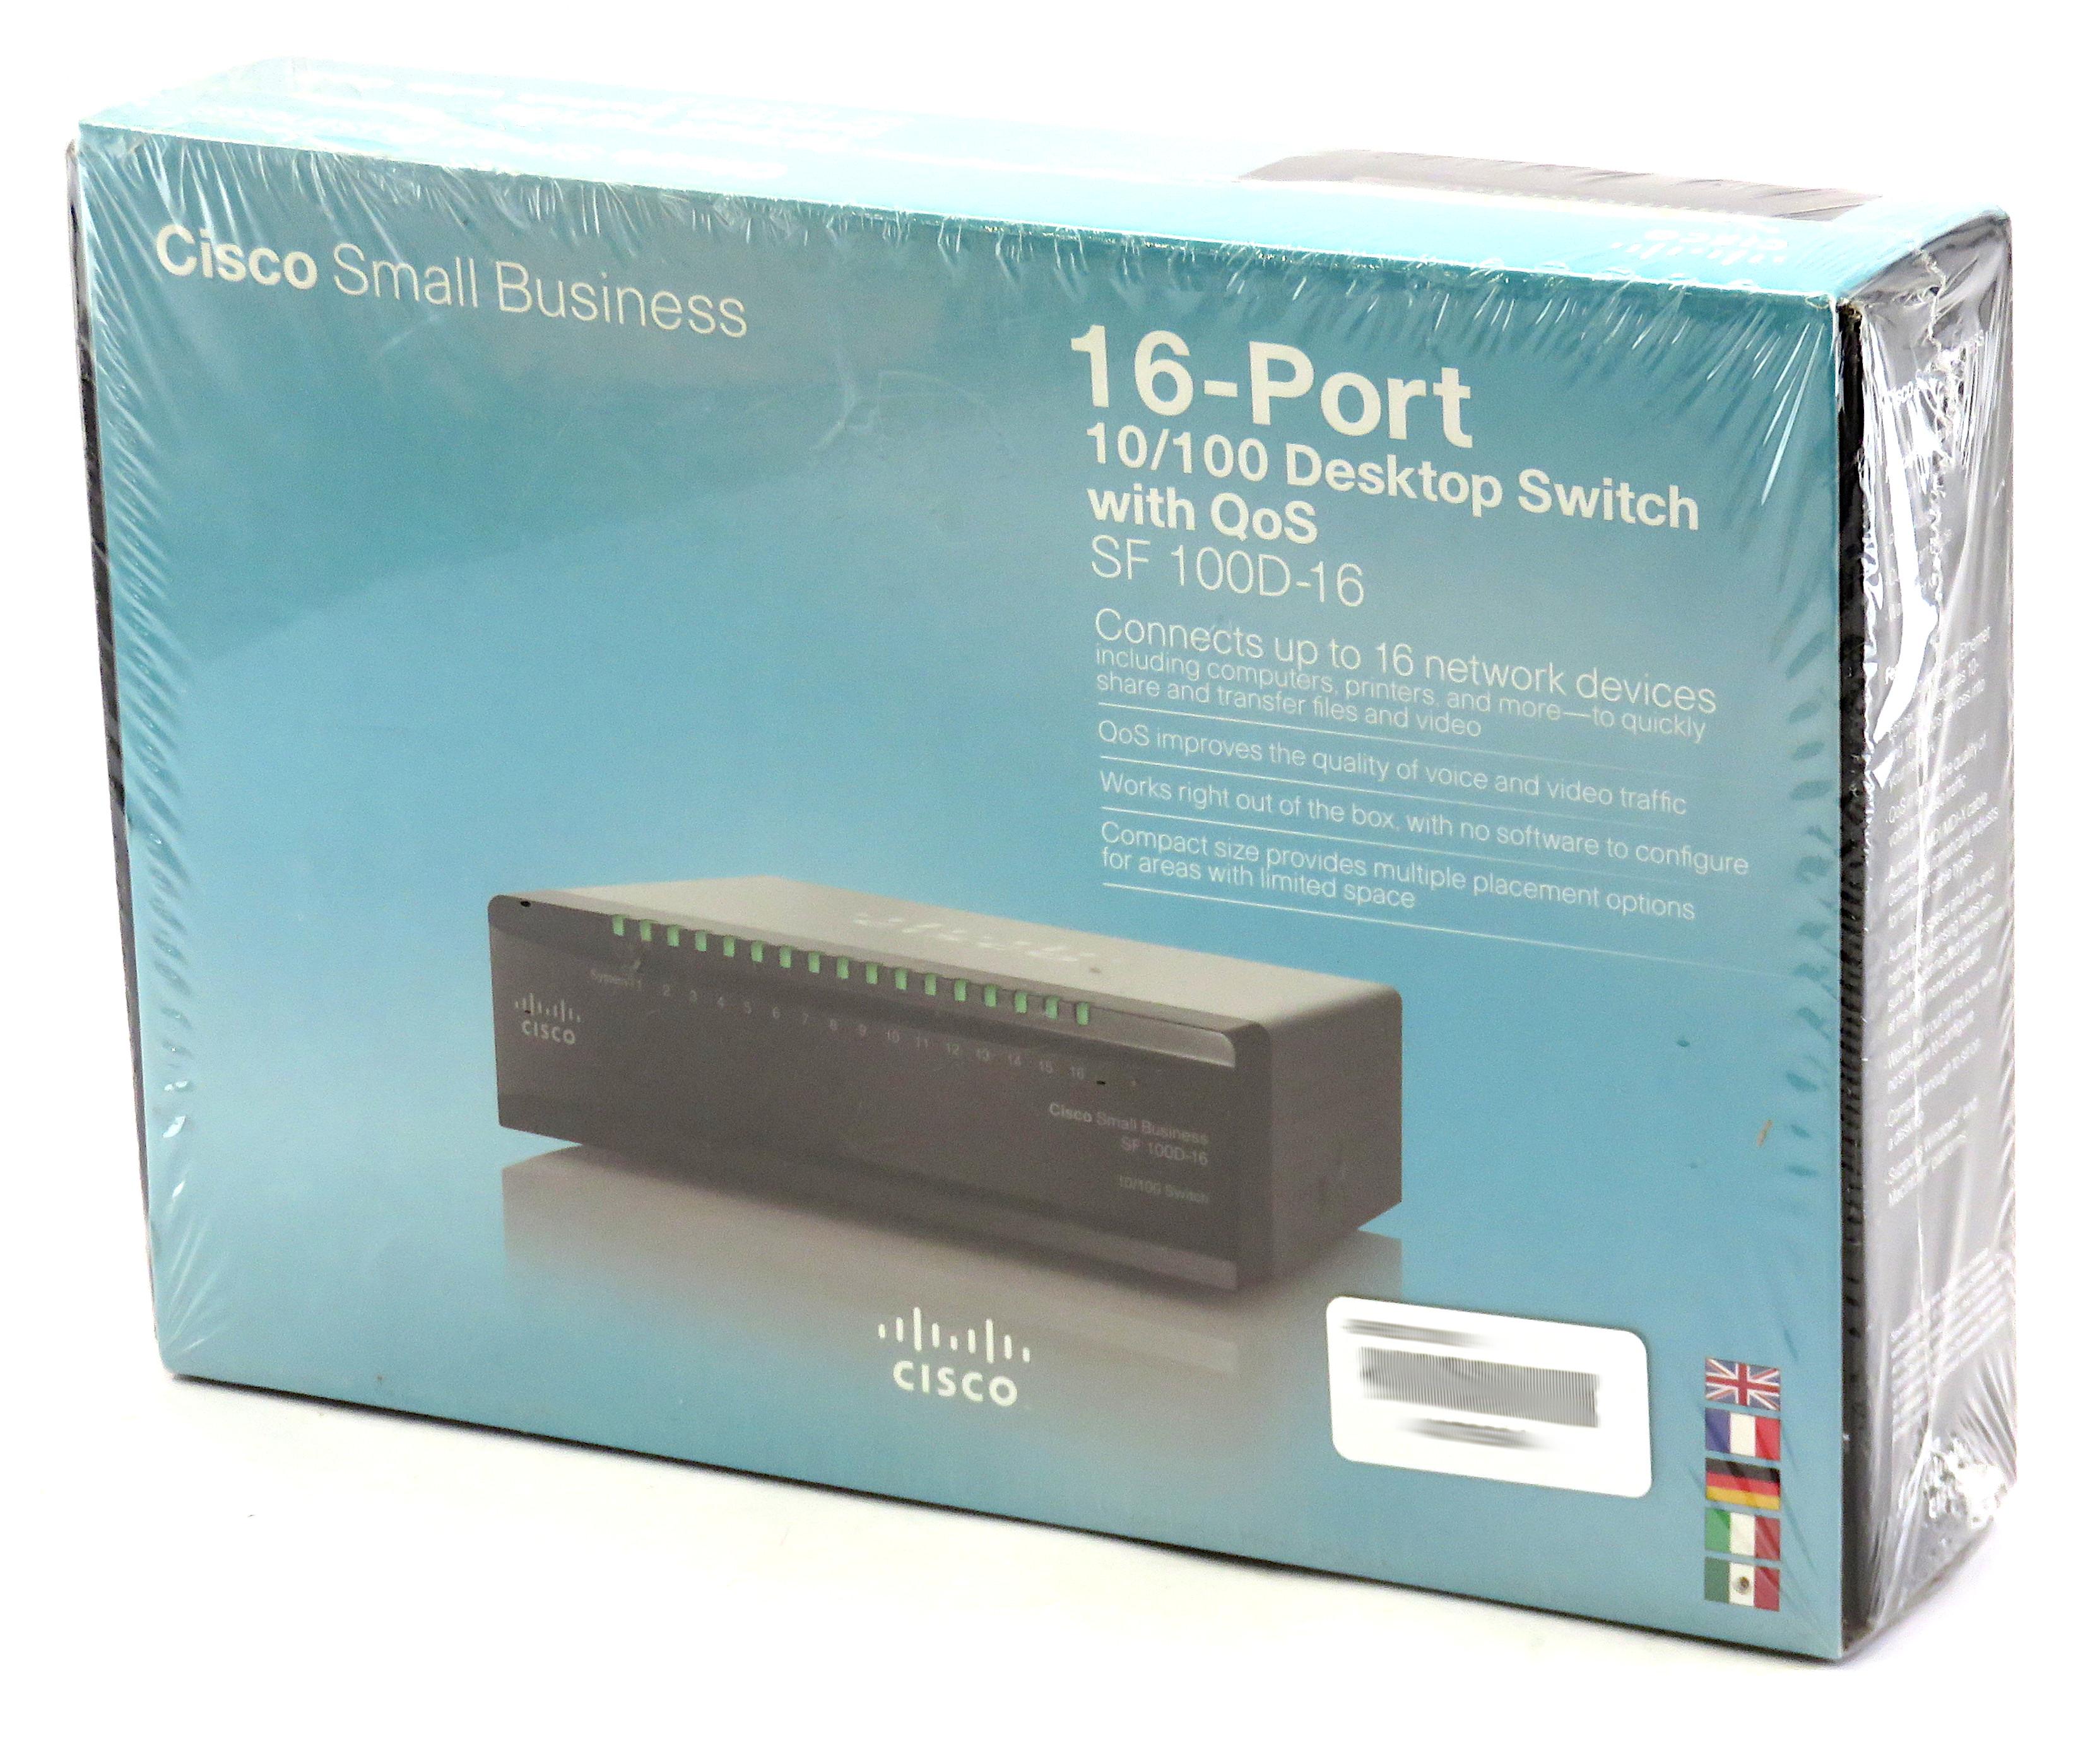 Cisco SF 100D-16 16-Port 10/100 Ethernet Desktop Switch w/ QoS SD216T-UK